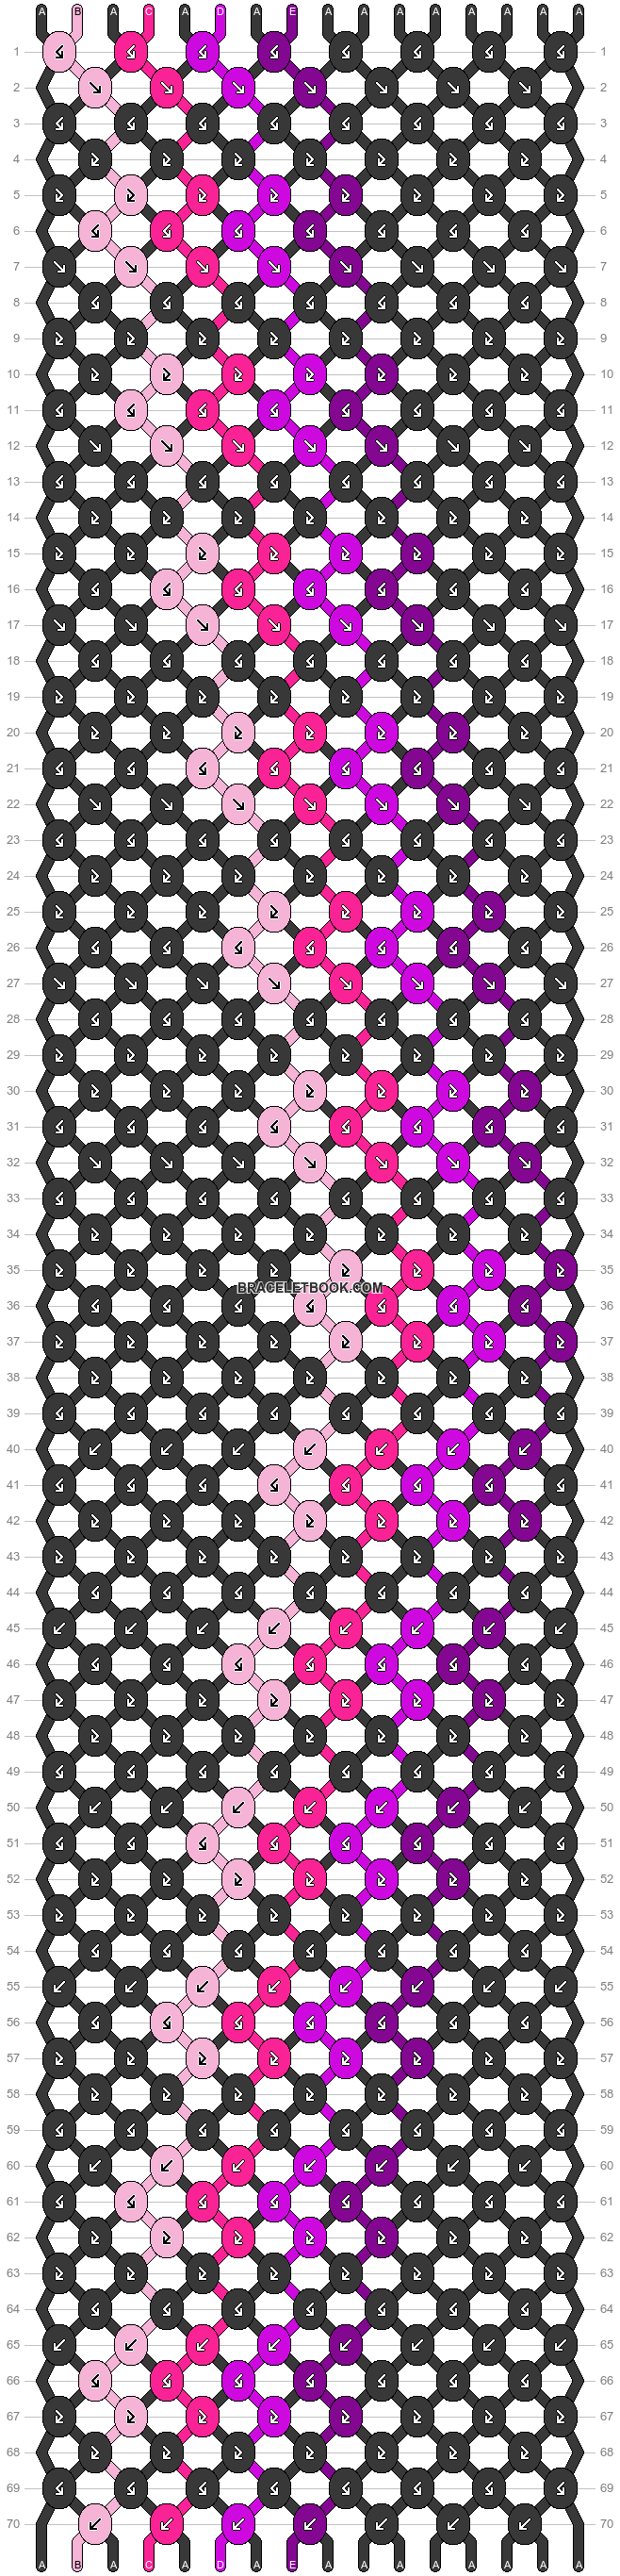 Normal Pattern #22507 added by CWillard